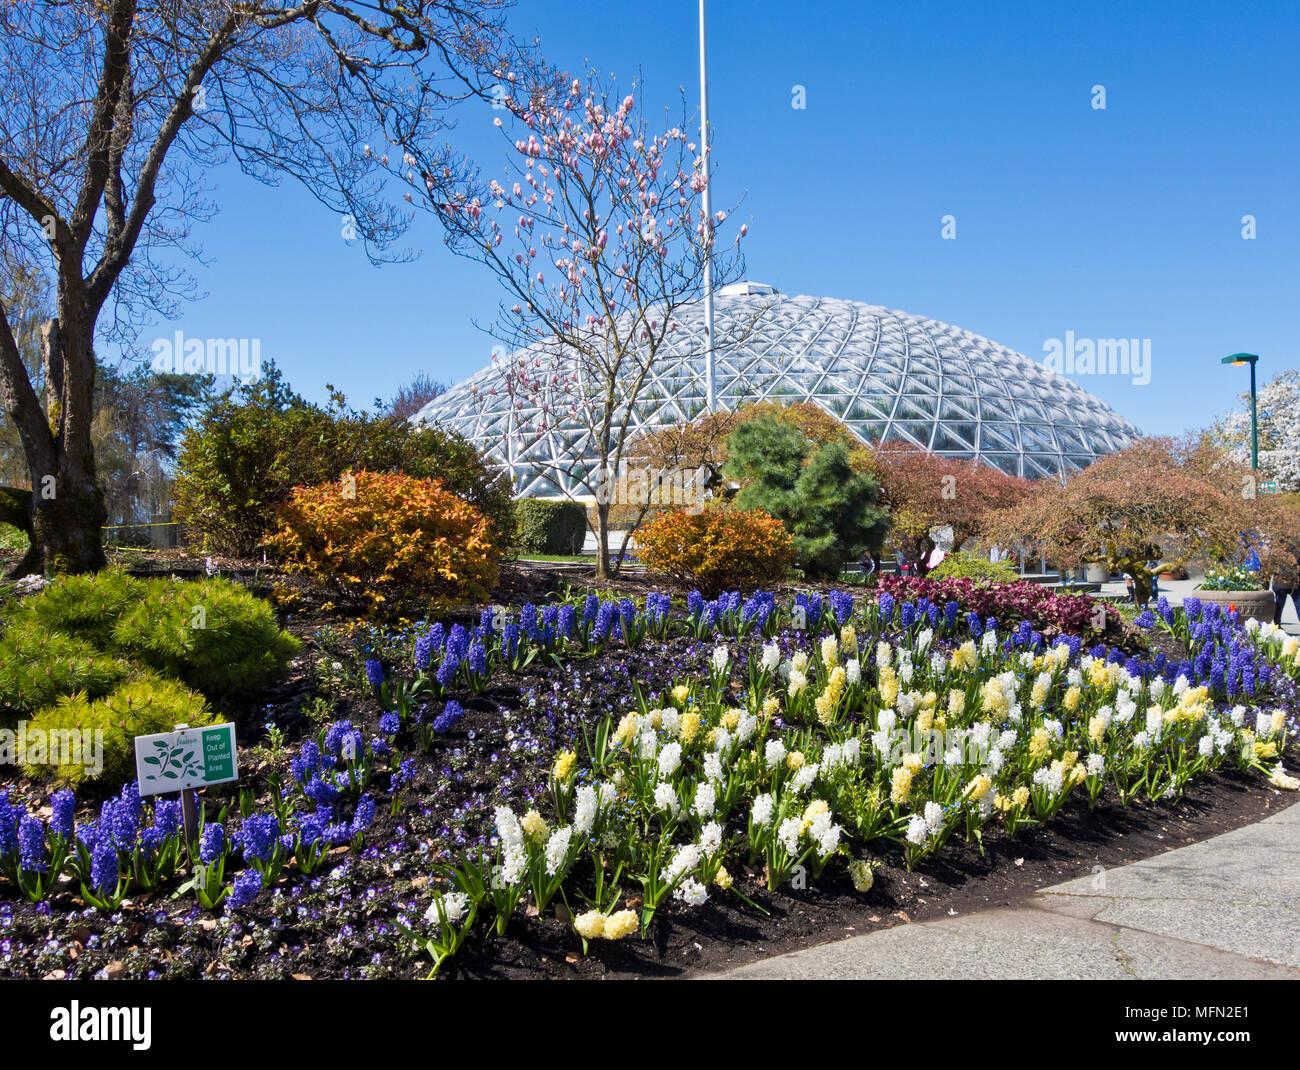 a6023d461e1b Spring in Queen Elizabeth Park